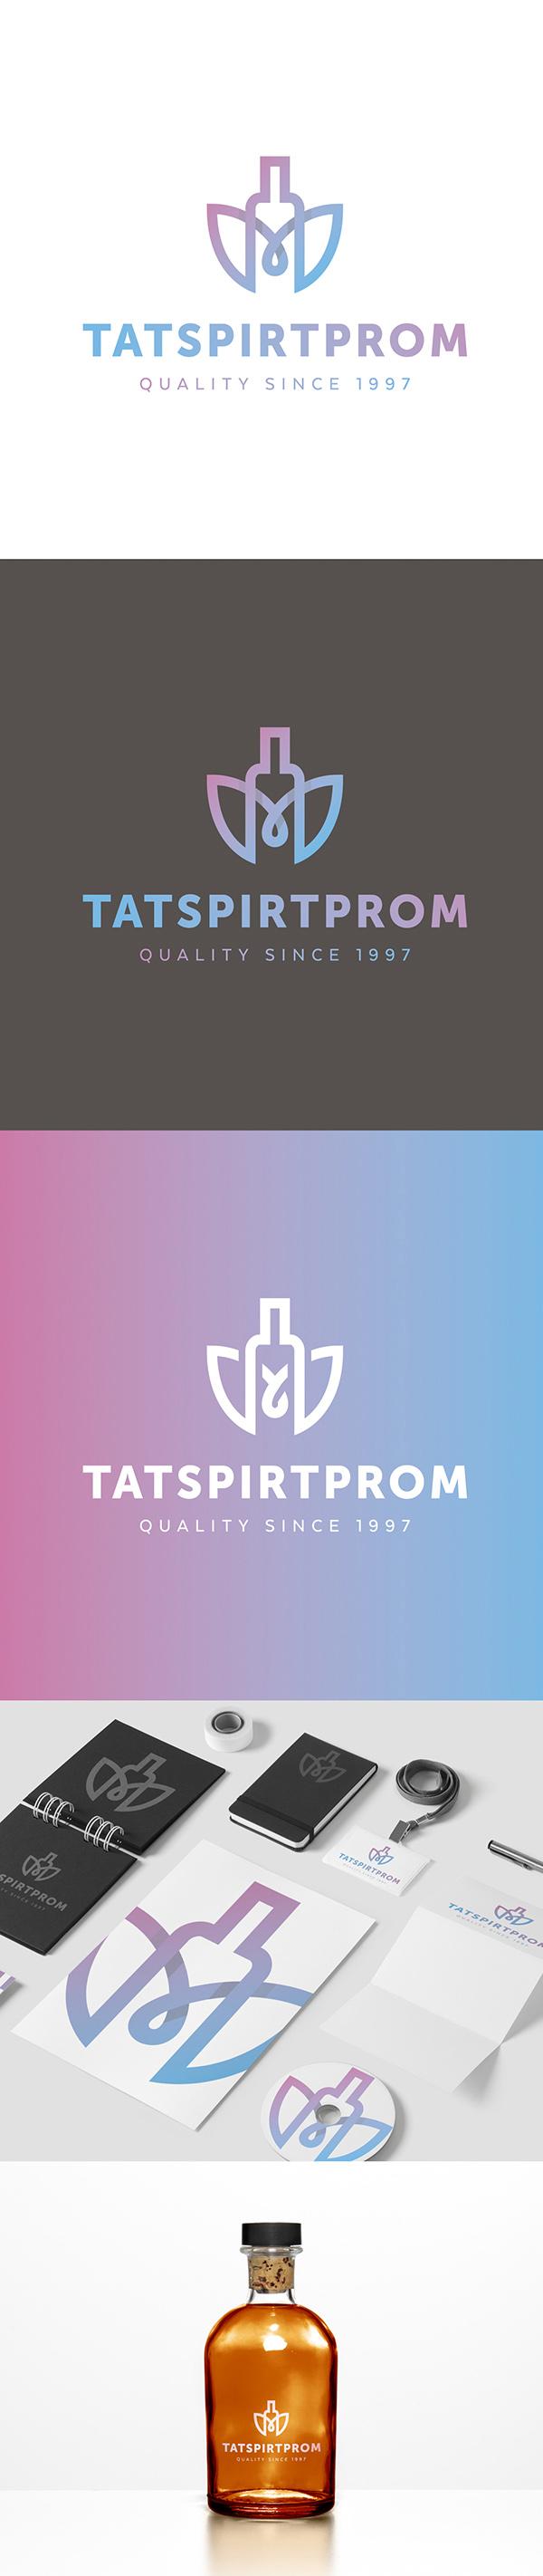 TatSpirtProm